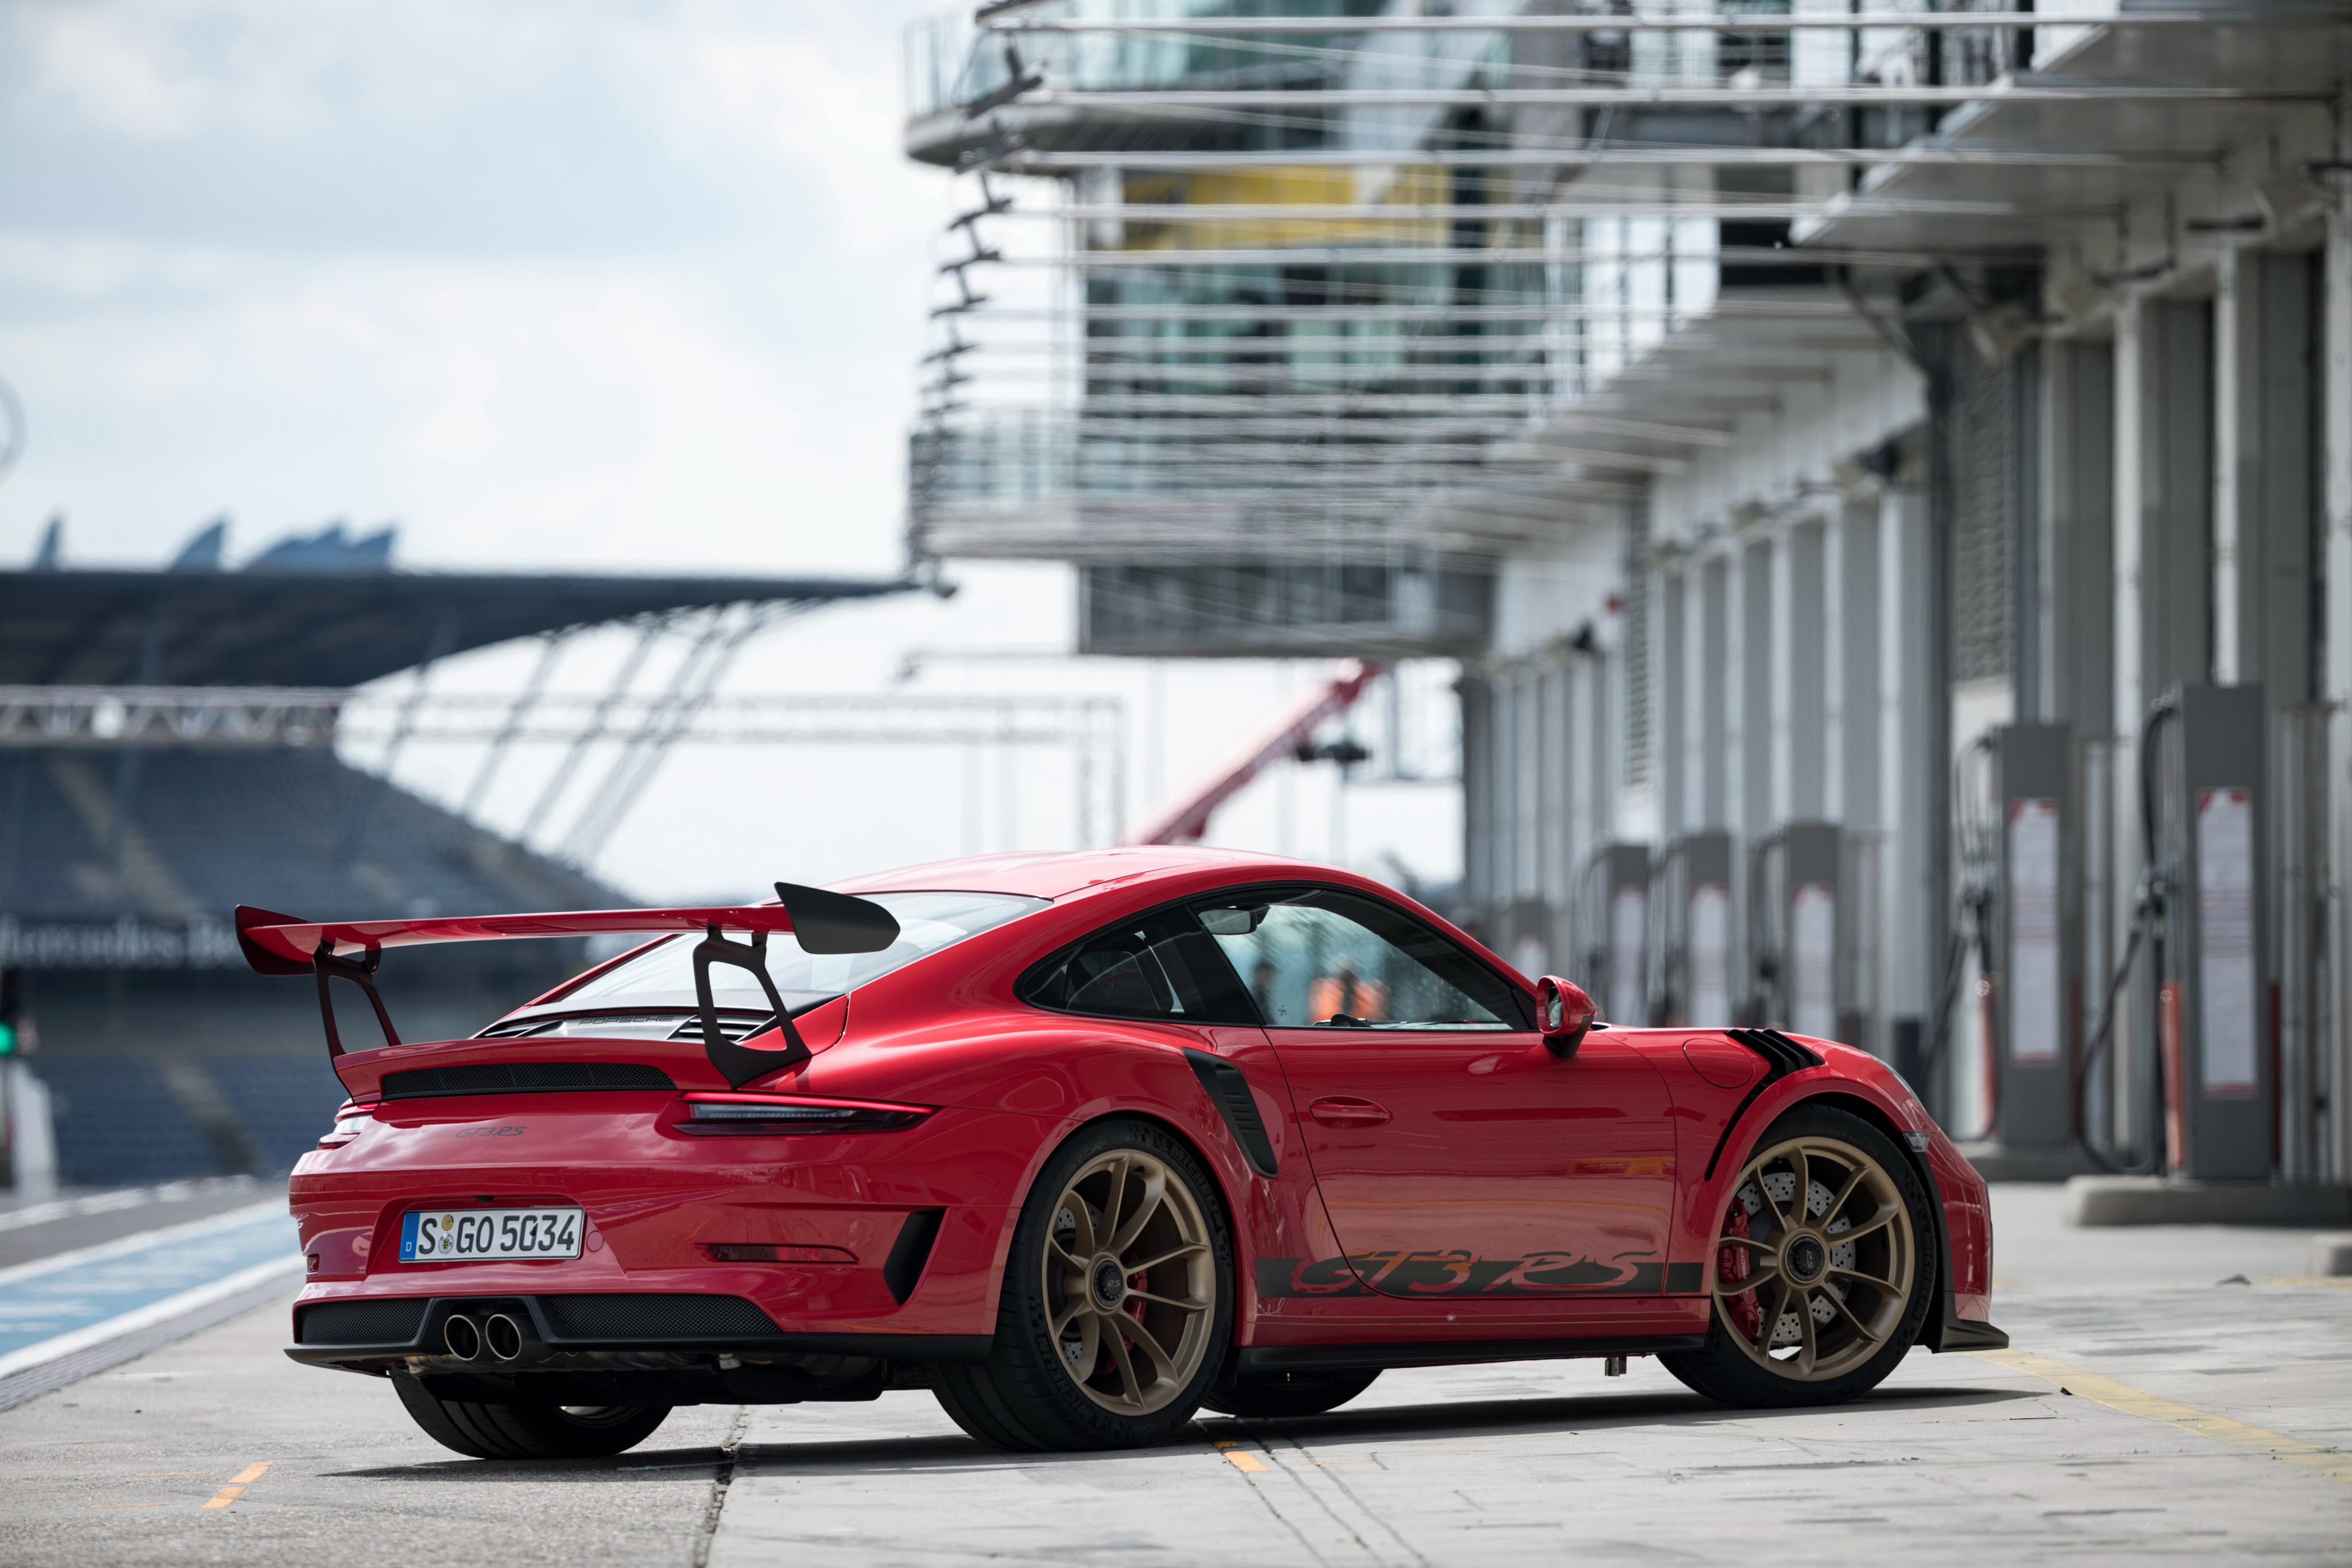 Porsche 911 GT3 RS 4k, HD Cars, 4k Wallpapers, Images